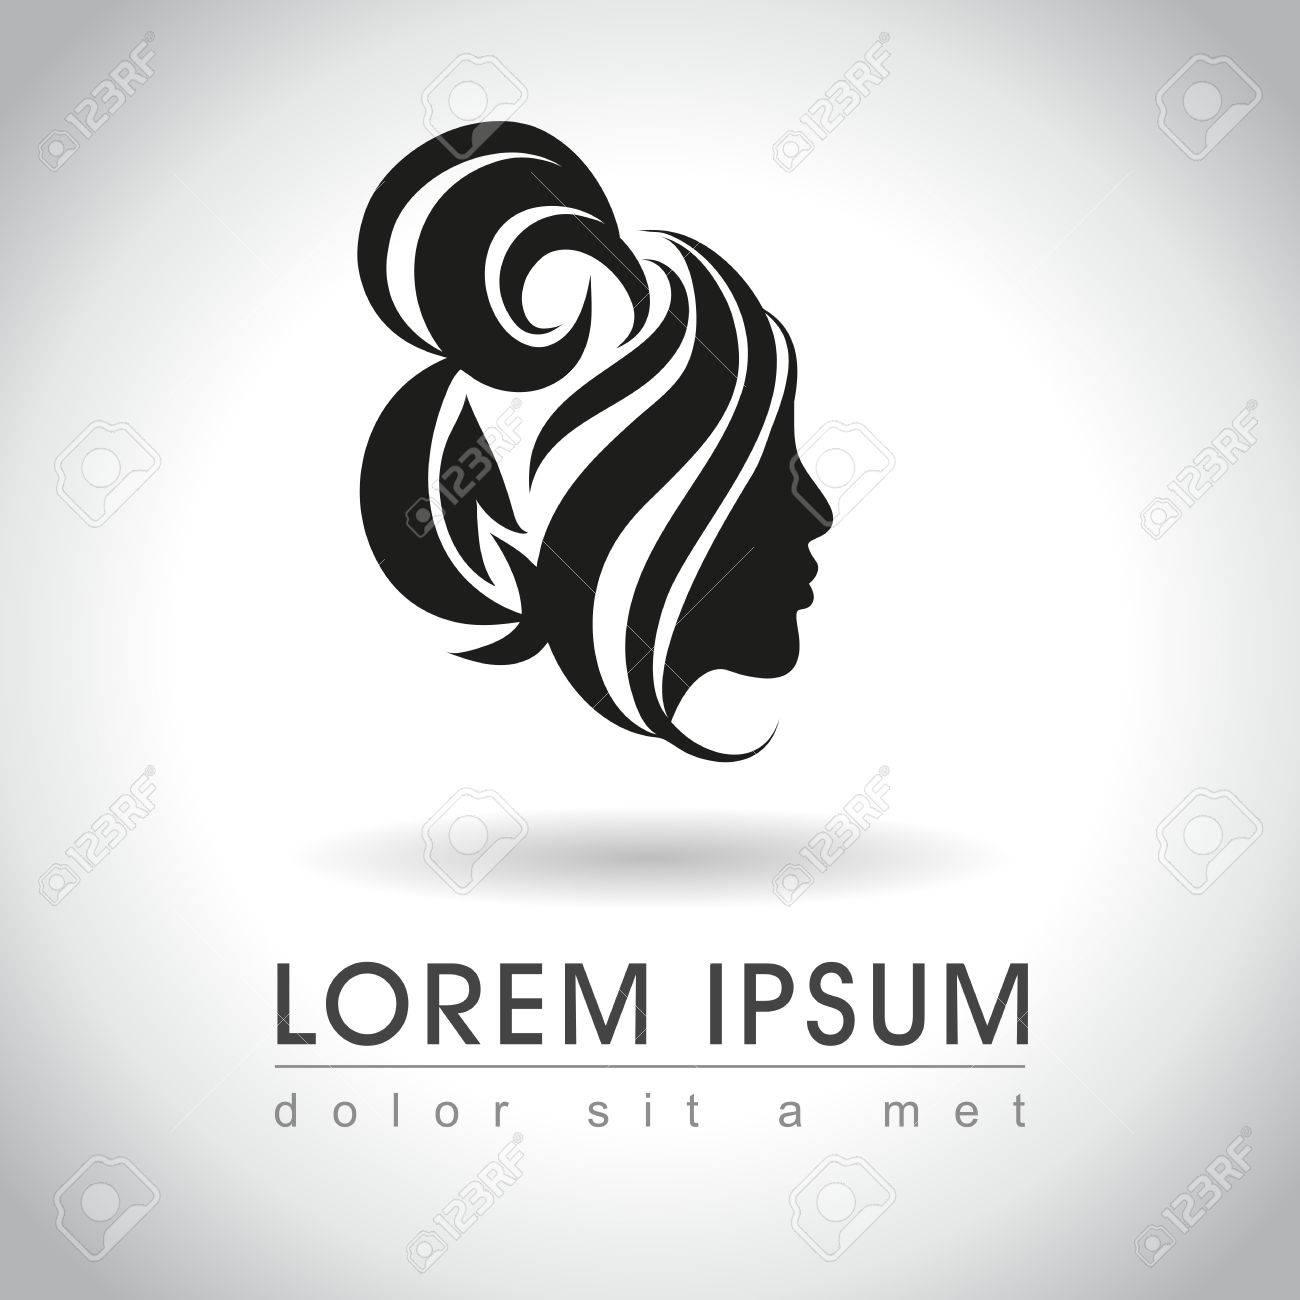 Beautiful Woman Face With Messy Bun Logo Sample, Vector ...